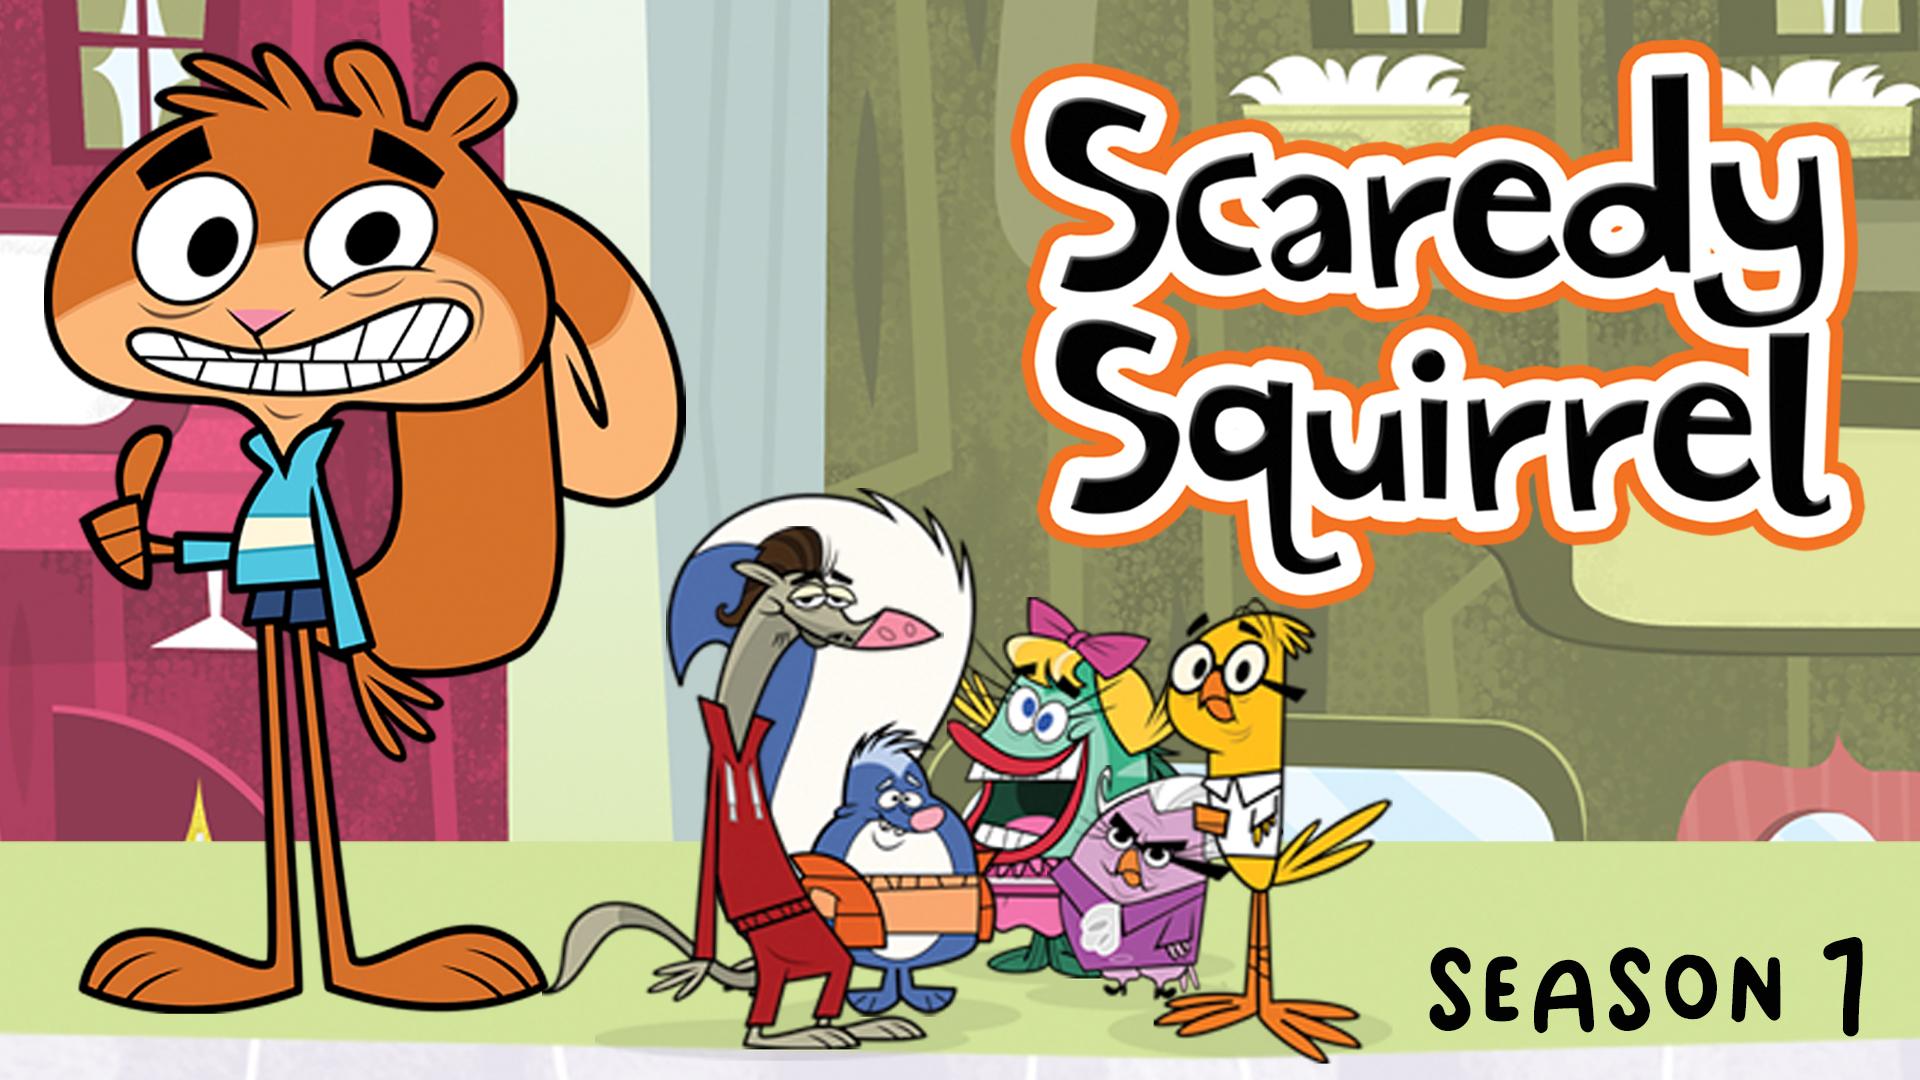 Scaredy Squirrel - Season 1